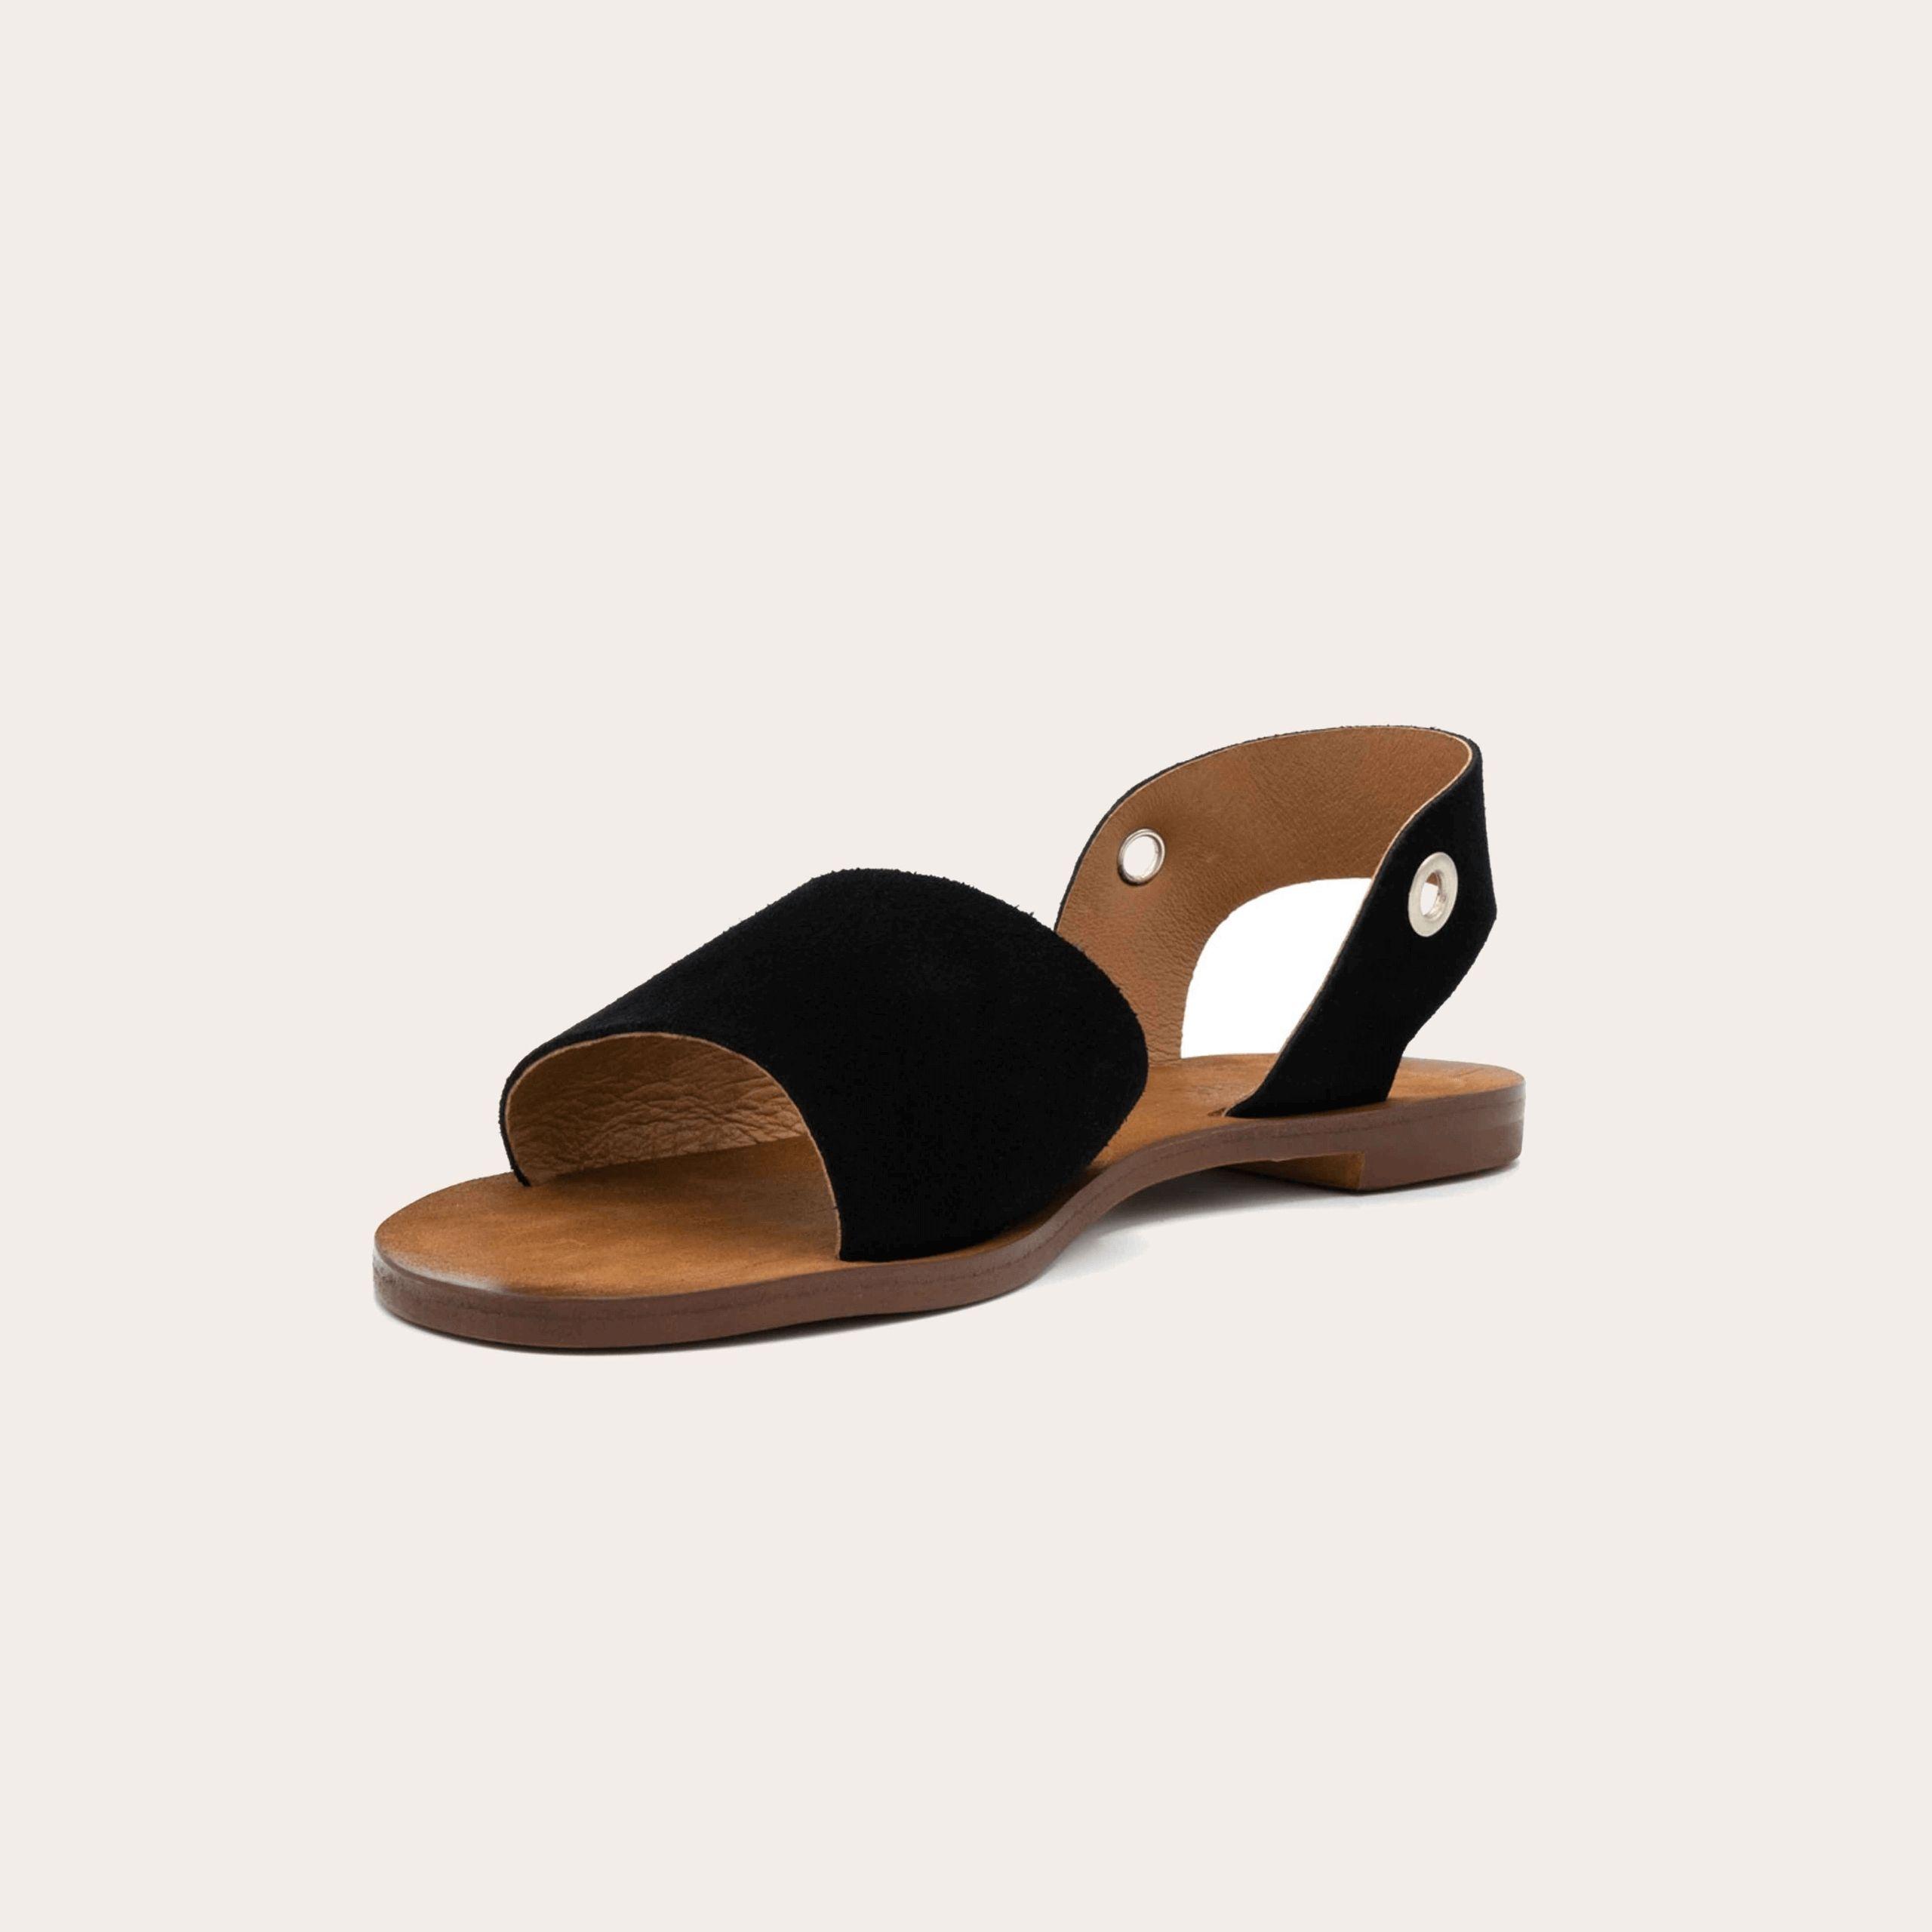 acapulco-black_4_lintsandalen sandals travelsandals vegan sustainable sandals wikkelsandalen